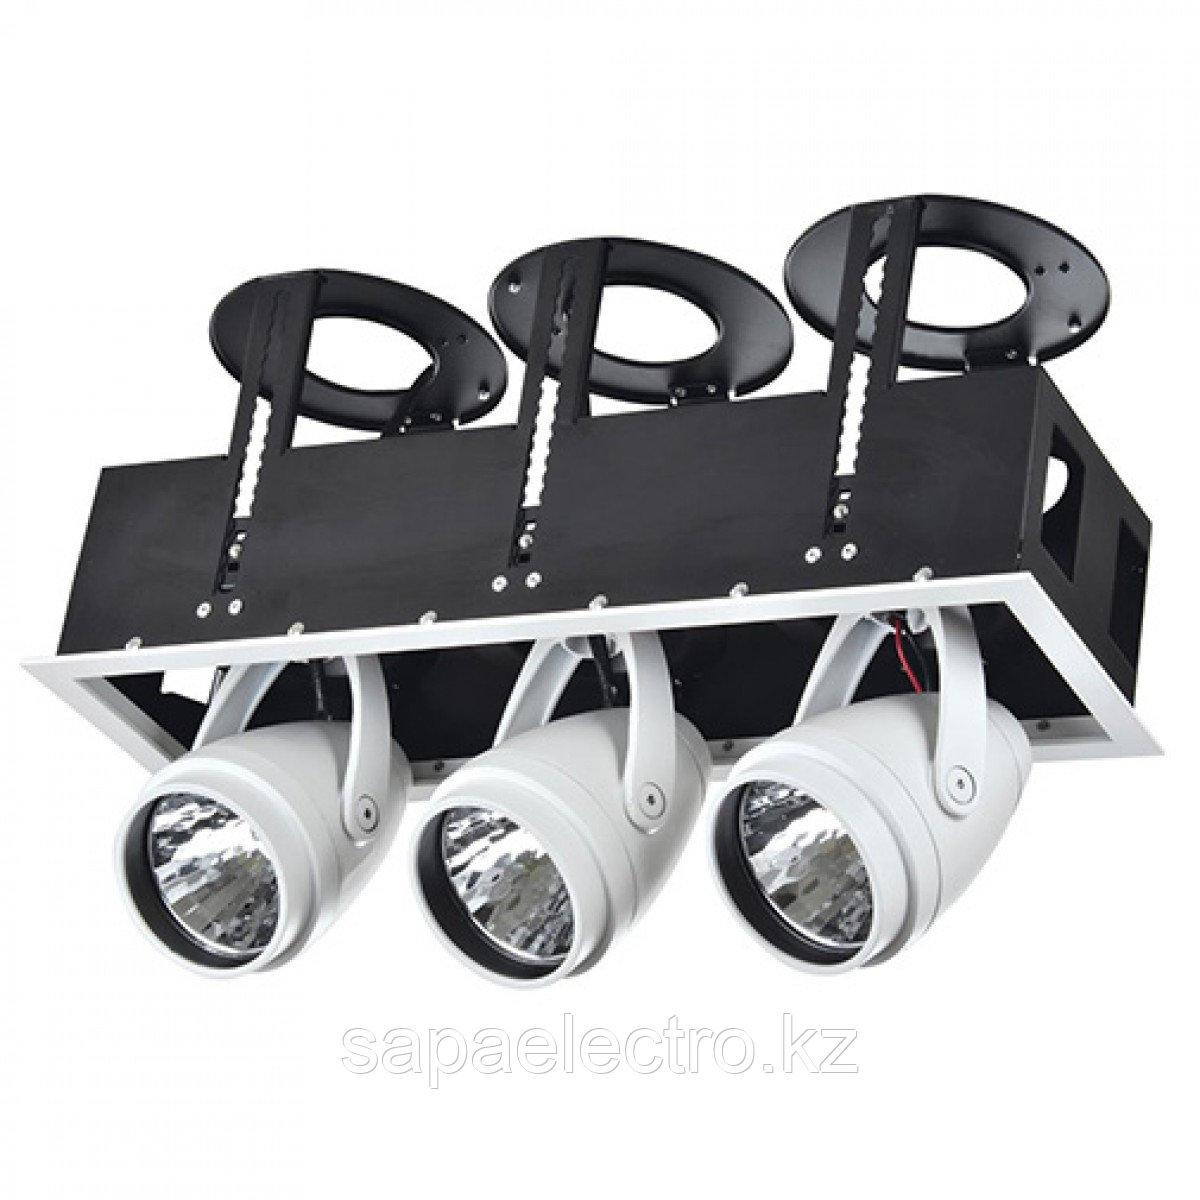 Свет-к DOWNLIGHT LED DK884-3 3х30W WH 5700K (TS)4